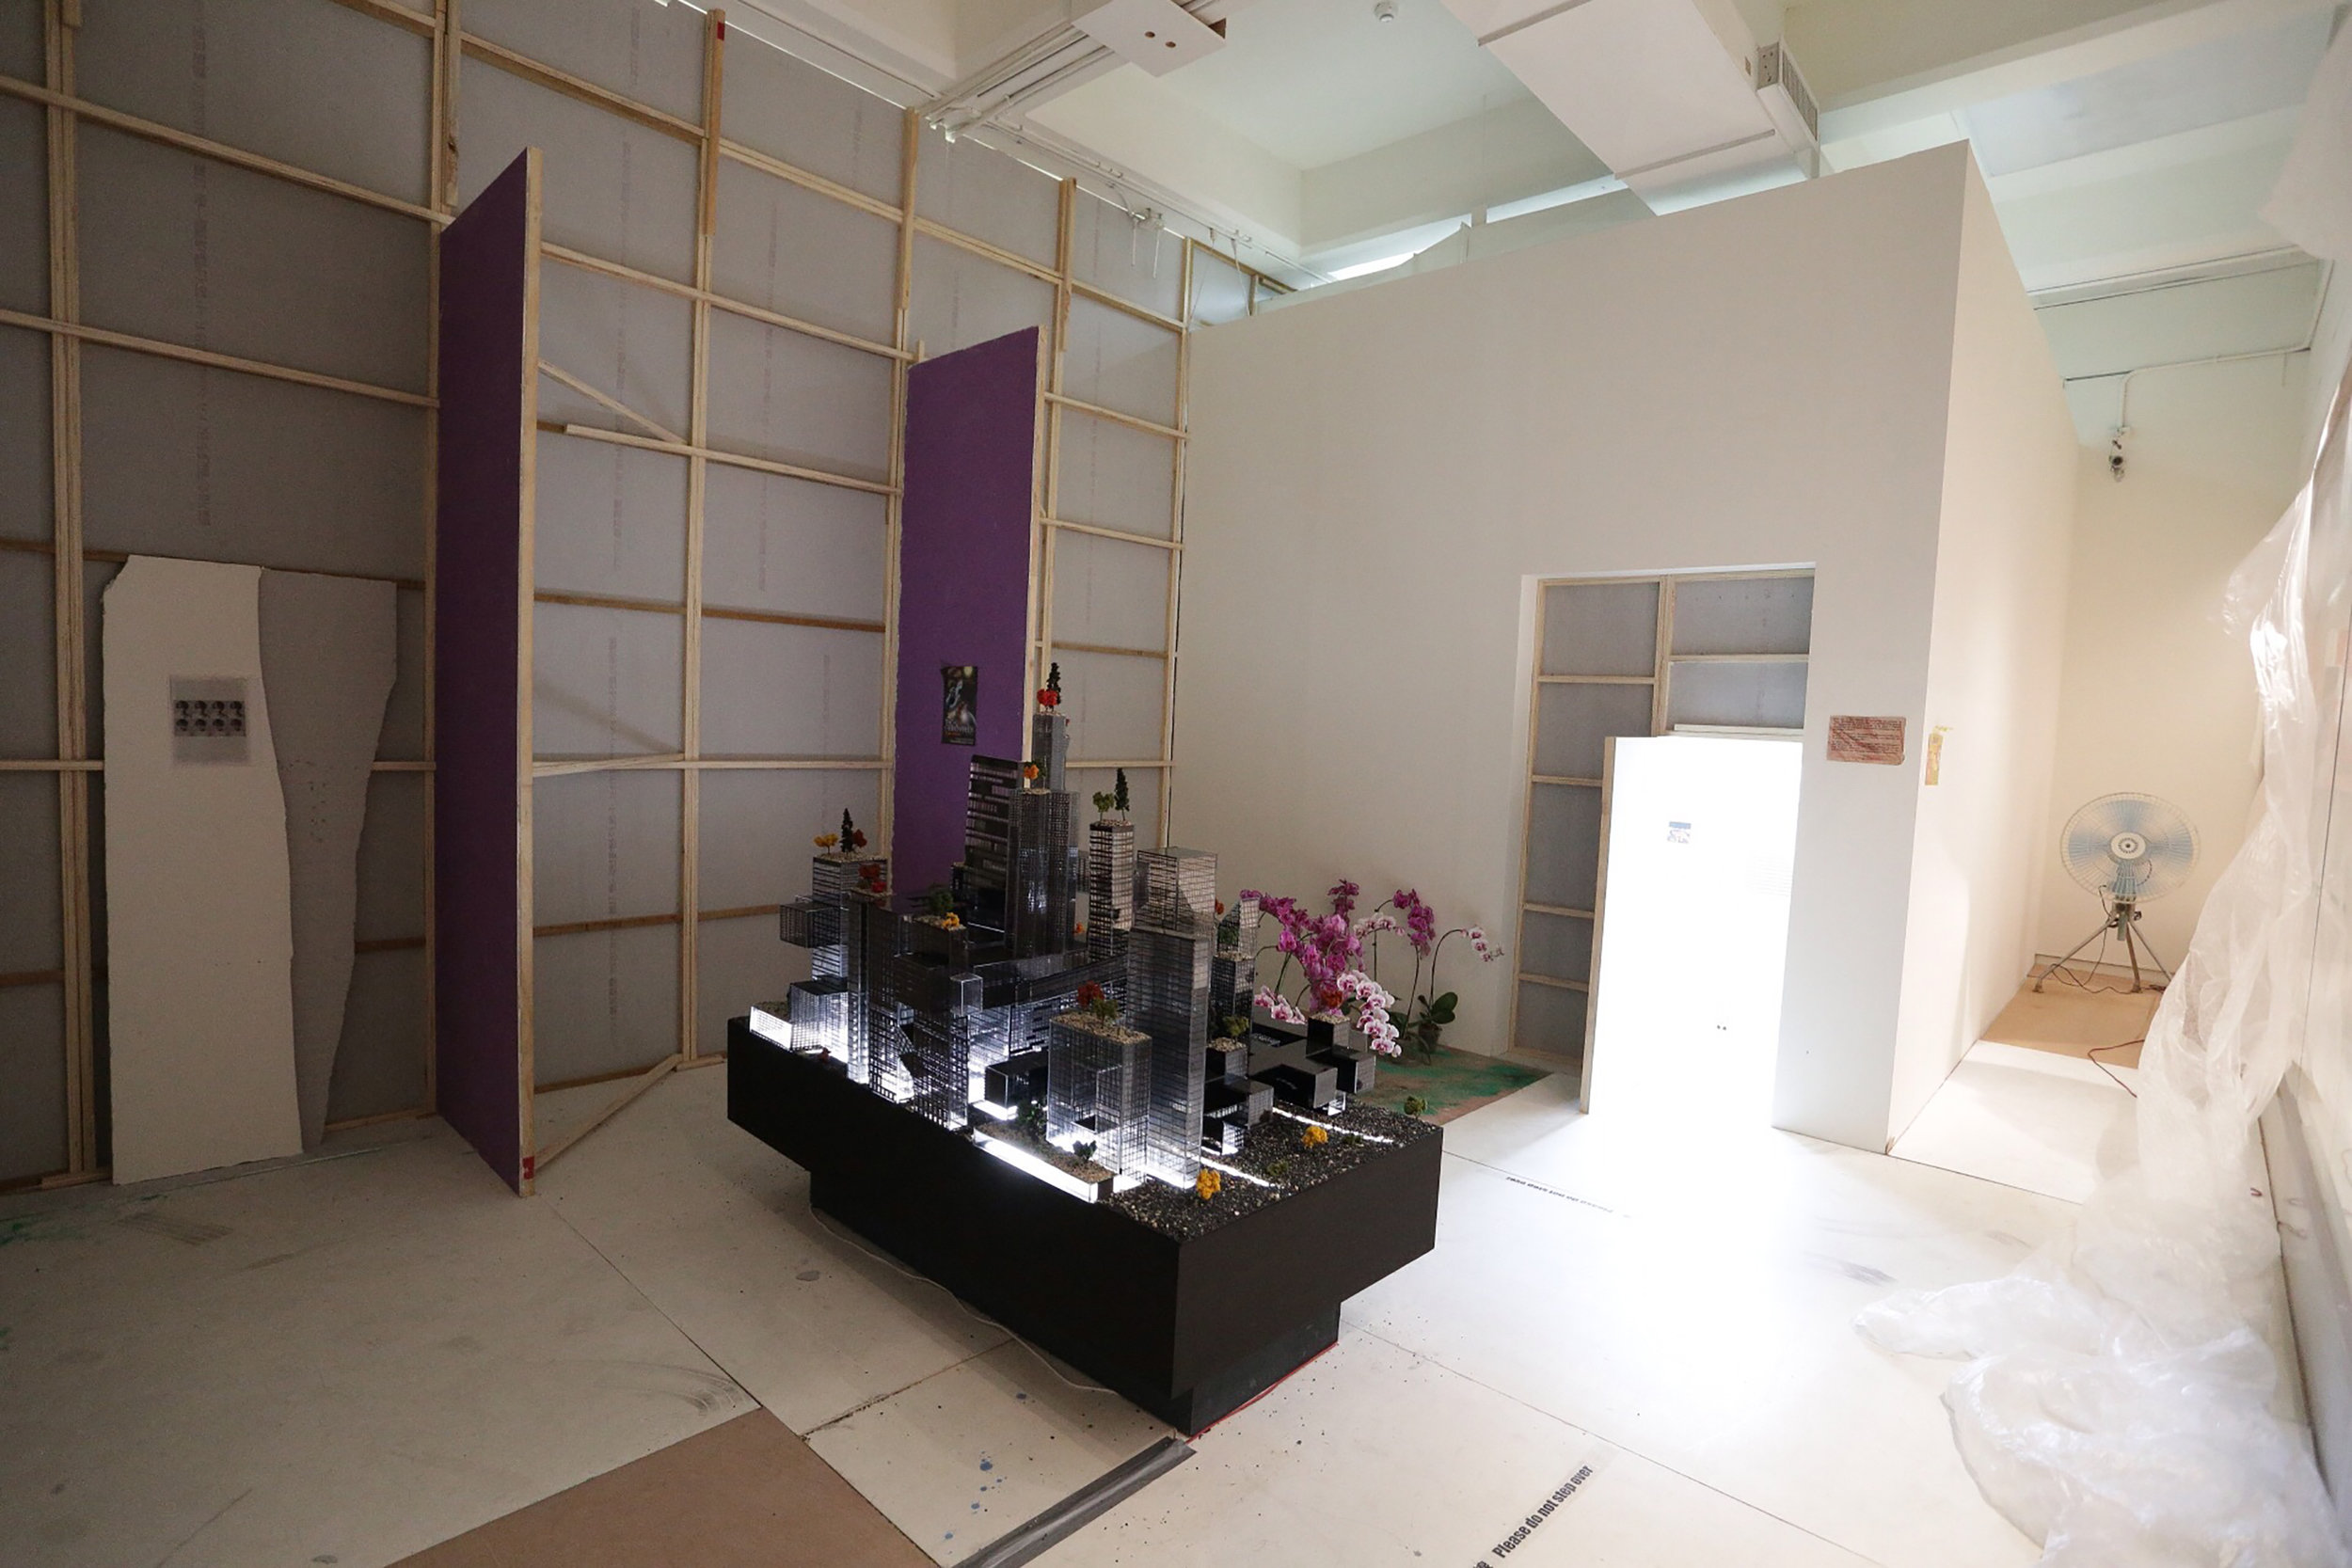 Freeman-Lowe, Installation View 26, Tai Pei Biennial, 2014.jpg